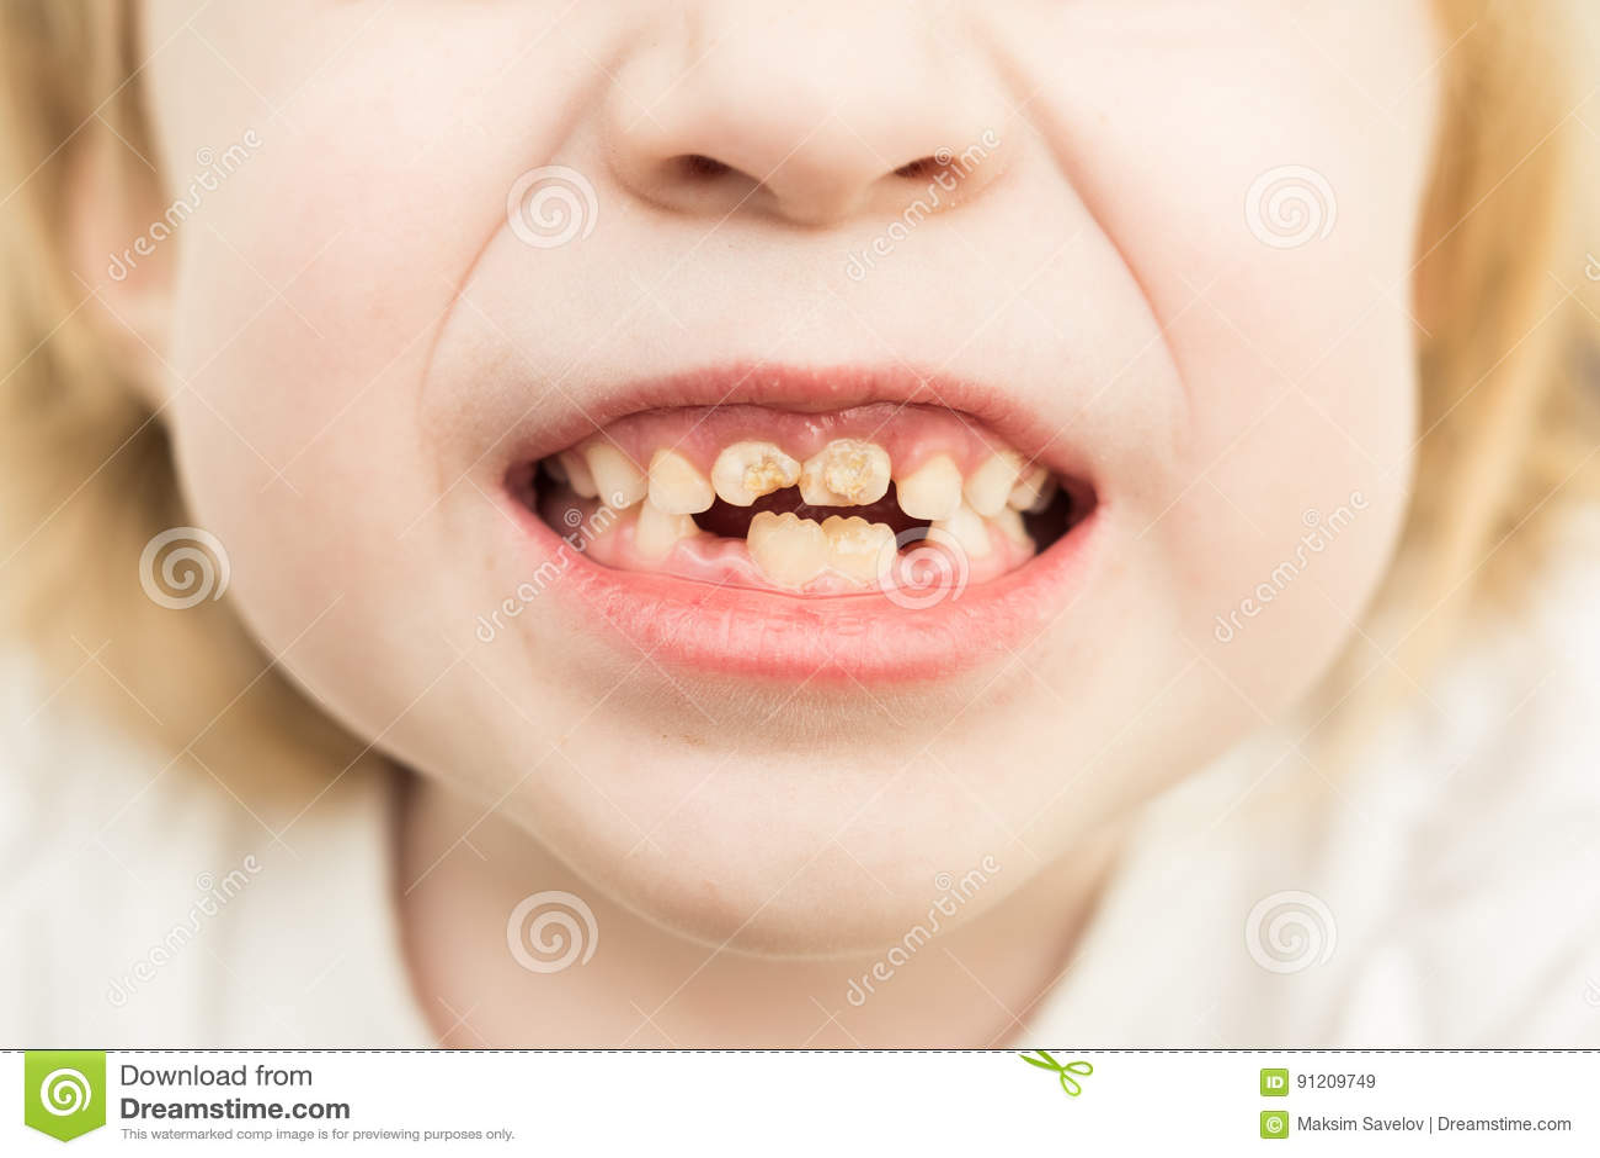 Mauvaises dents